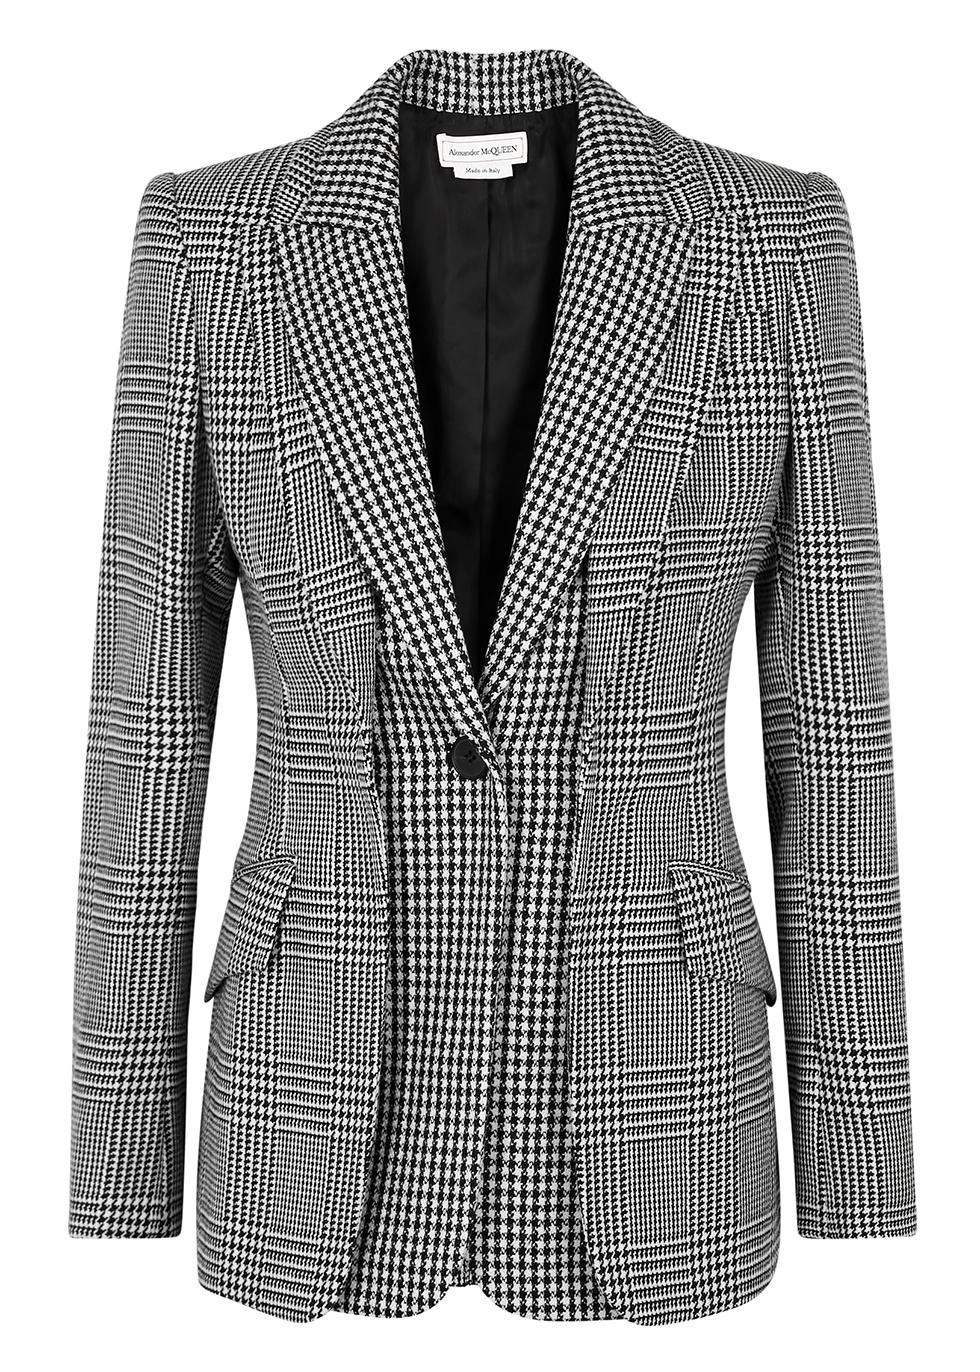 c835aaadec6f7e Women s Designer Clothing